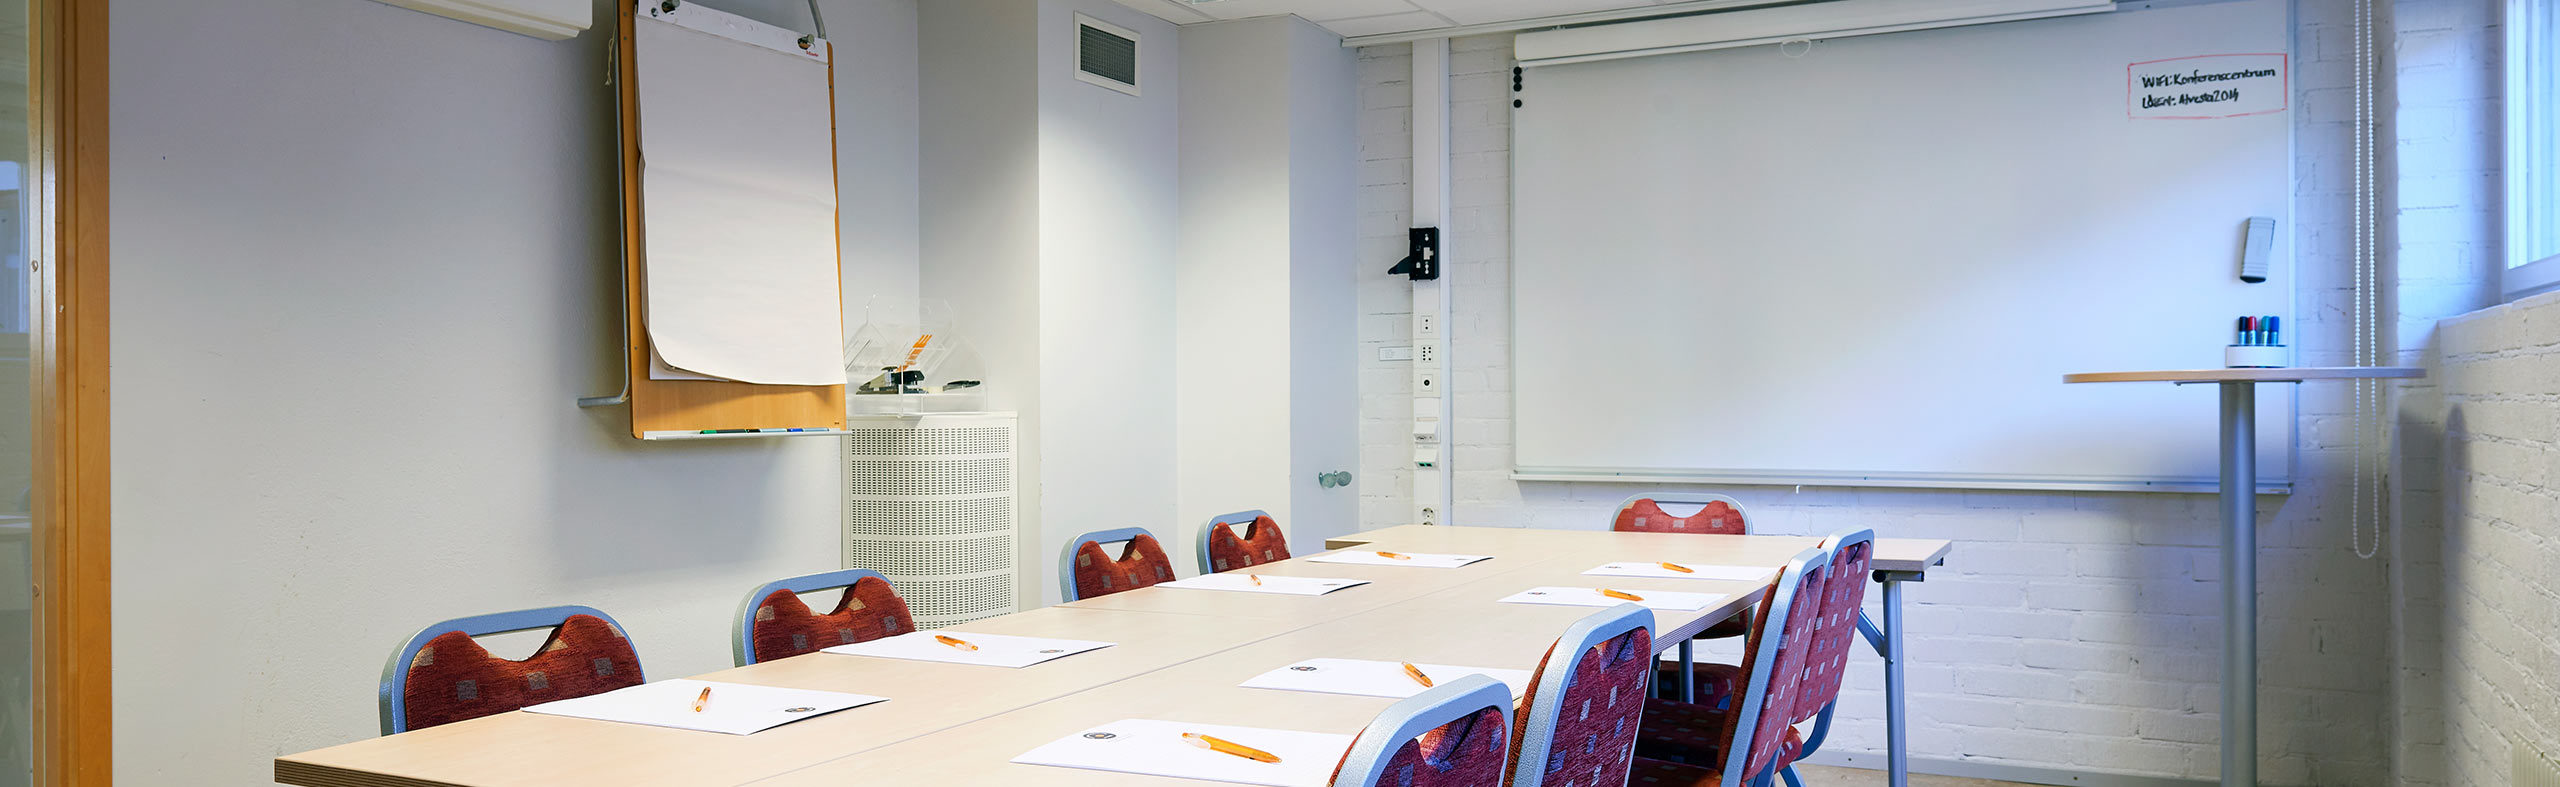 Konferensrum Dressinen Hotell Rådmannen